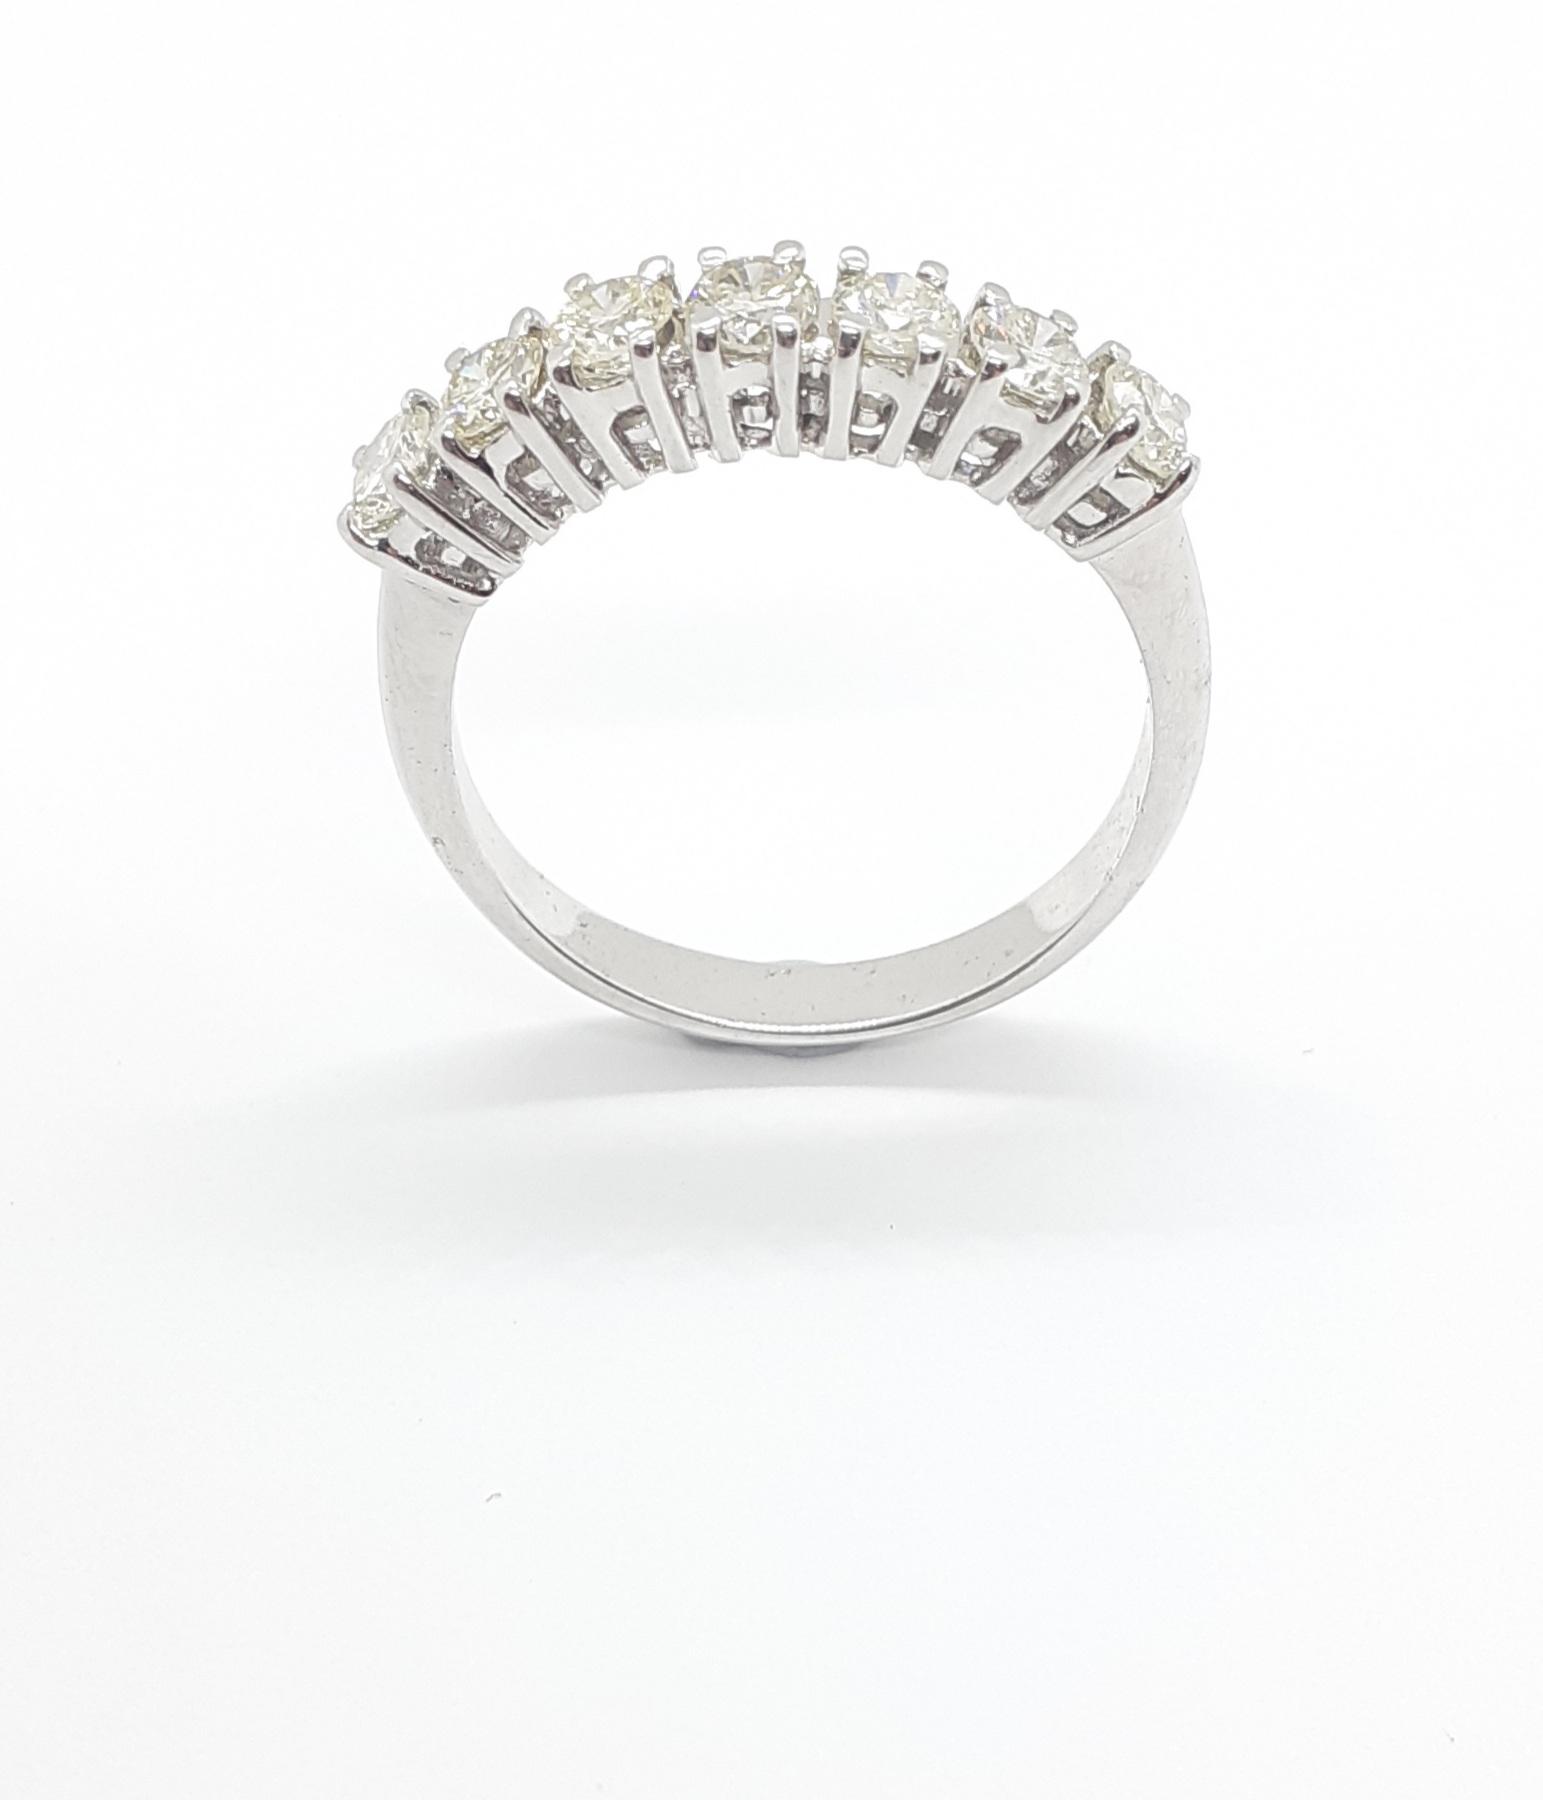 Sensi joyas jewellery Granada silver engagementDIAMONDS  RING  0,84 CTS